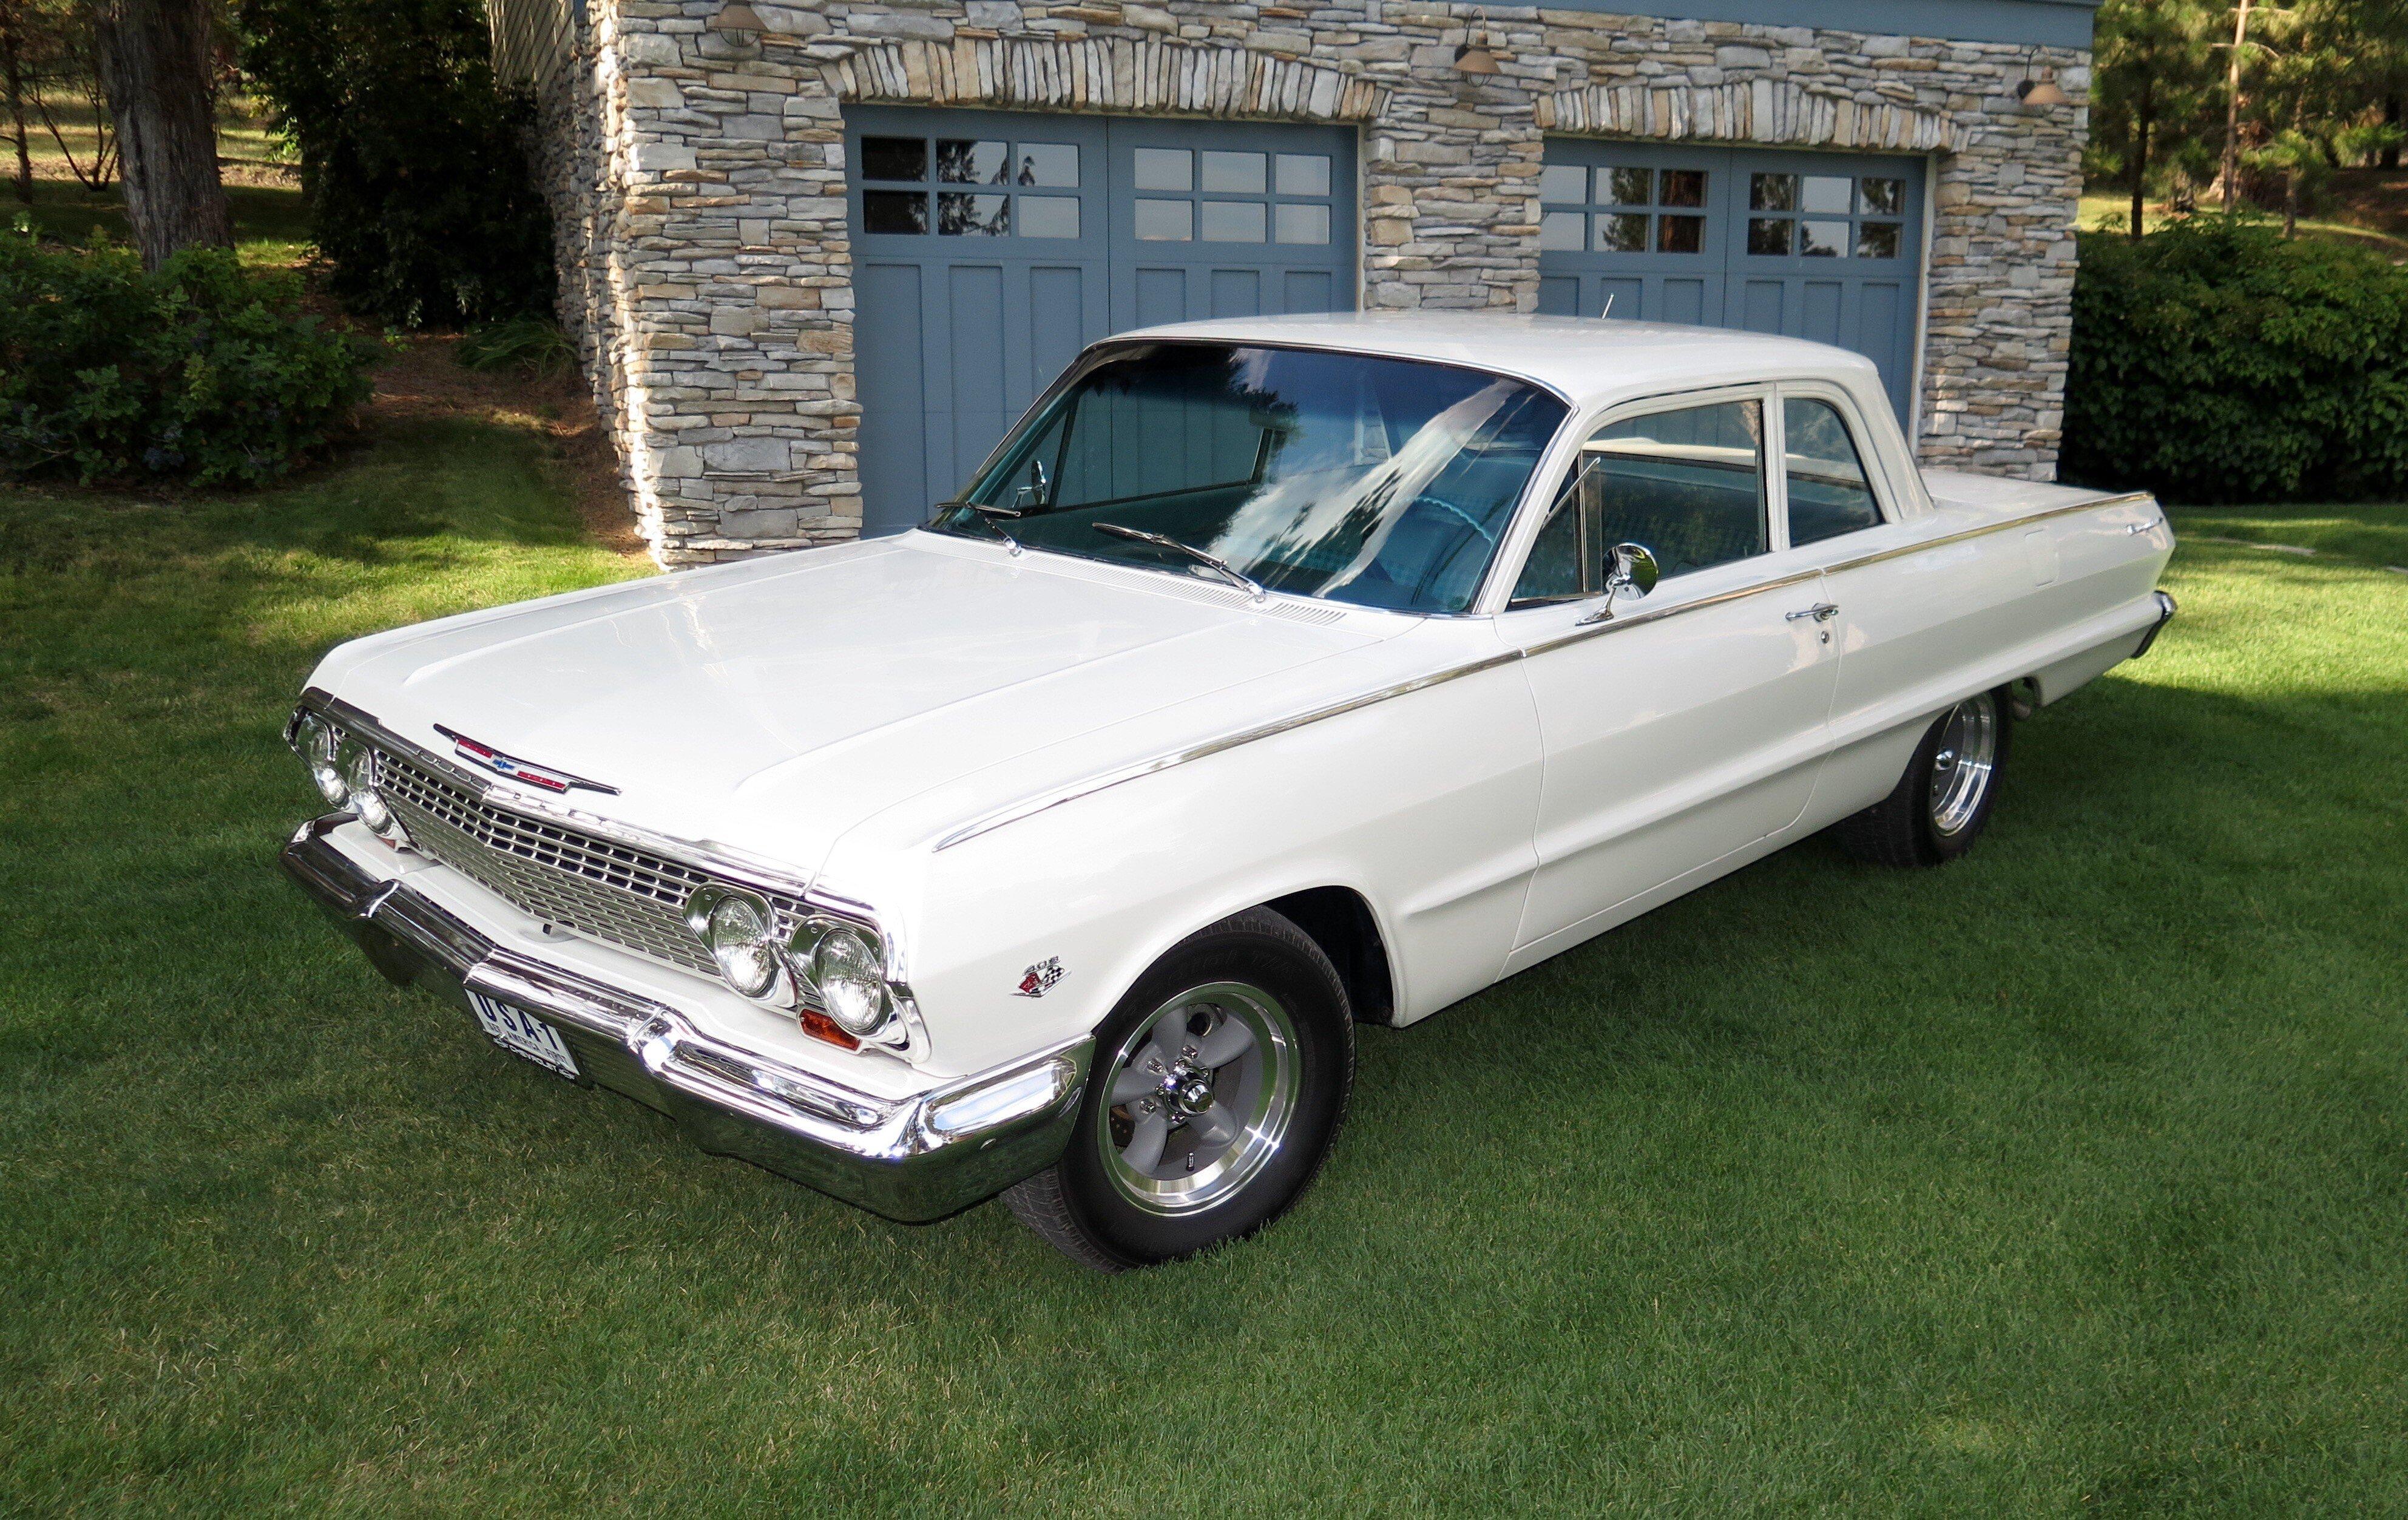 1963 Chevrolet Biscayne For Sale Near Dayton Montana 59914 Classics On Autotrader